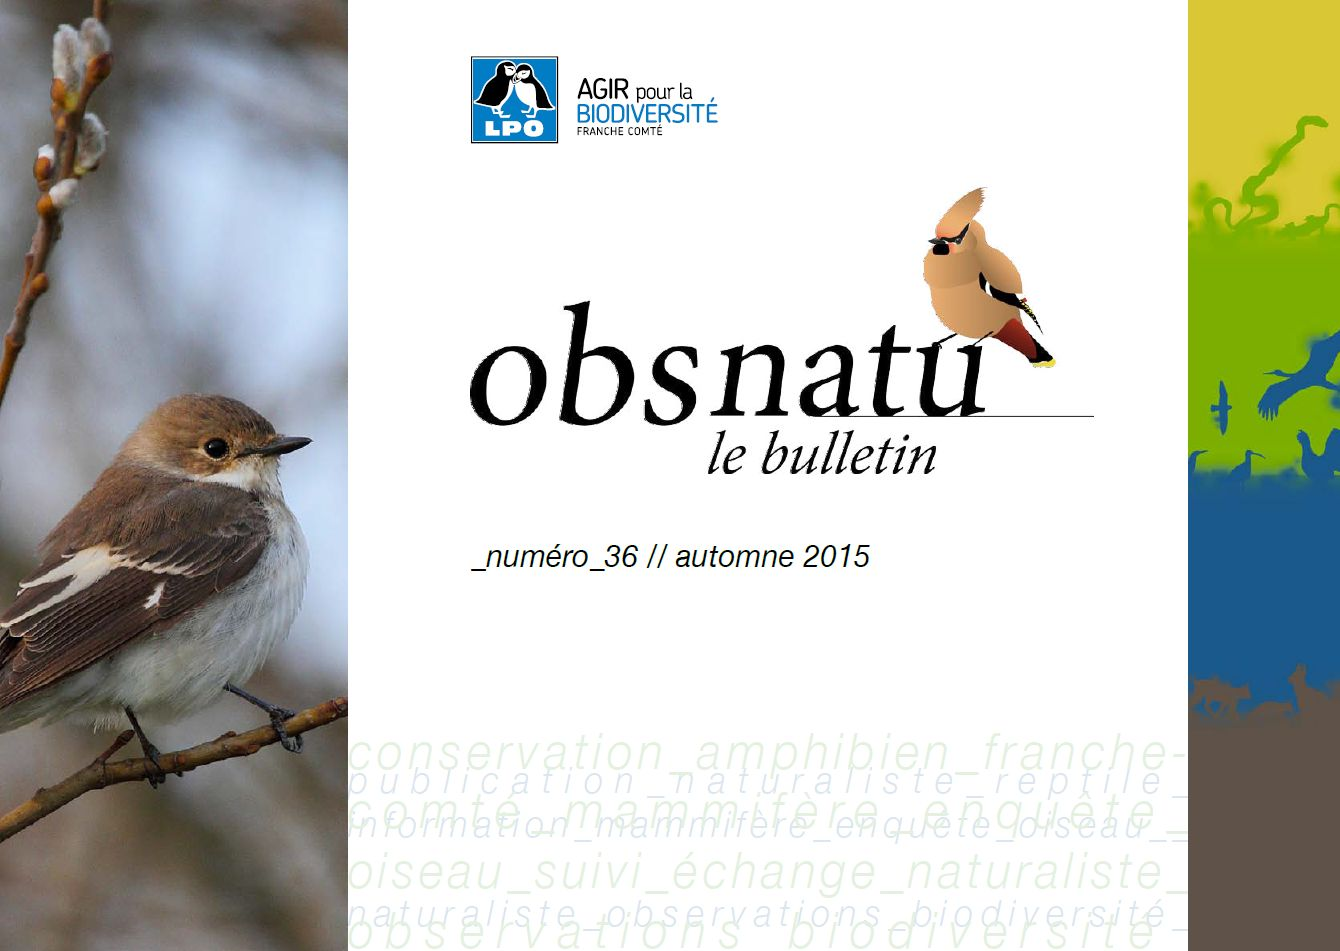 https://cdnfiles2.biolovision.net/franche-comte.lpo.fr/userfiles/publications/Obsnatubulls/Obsnatun36automne2015couv.jpg